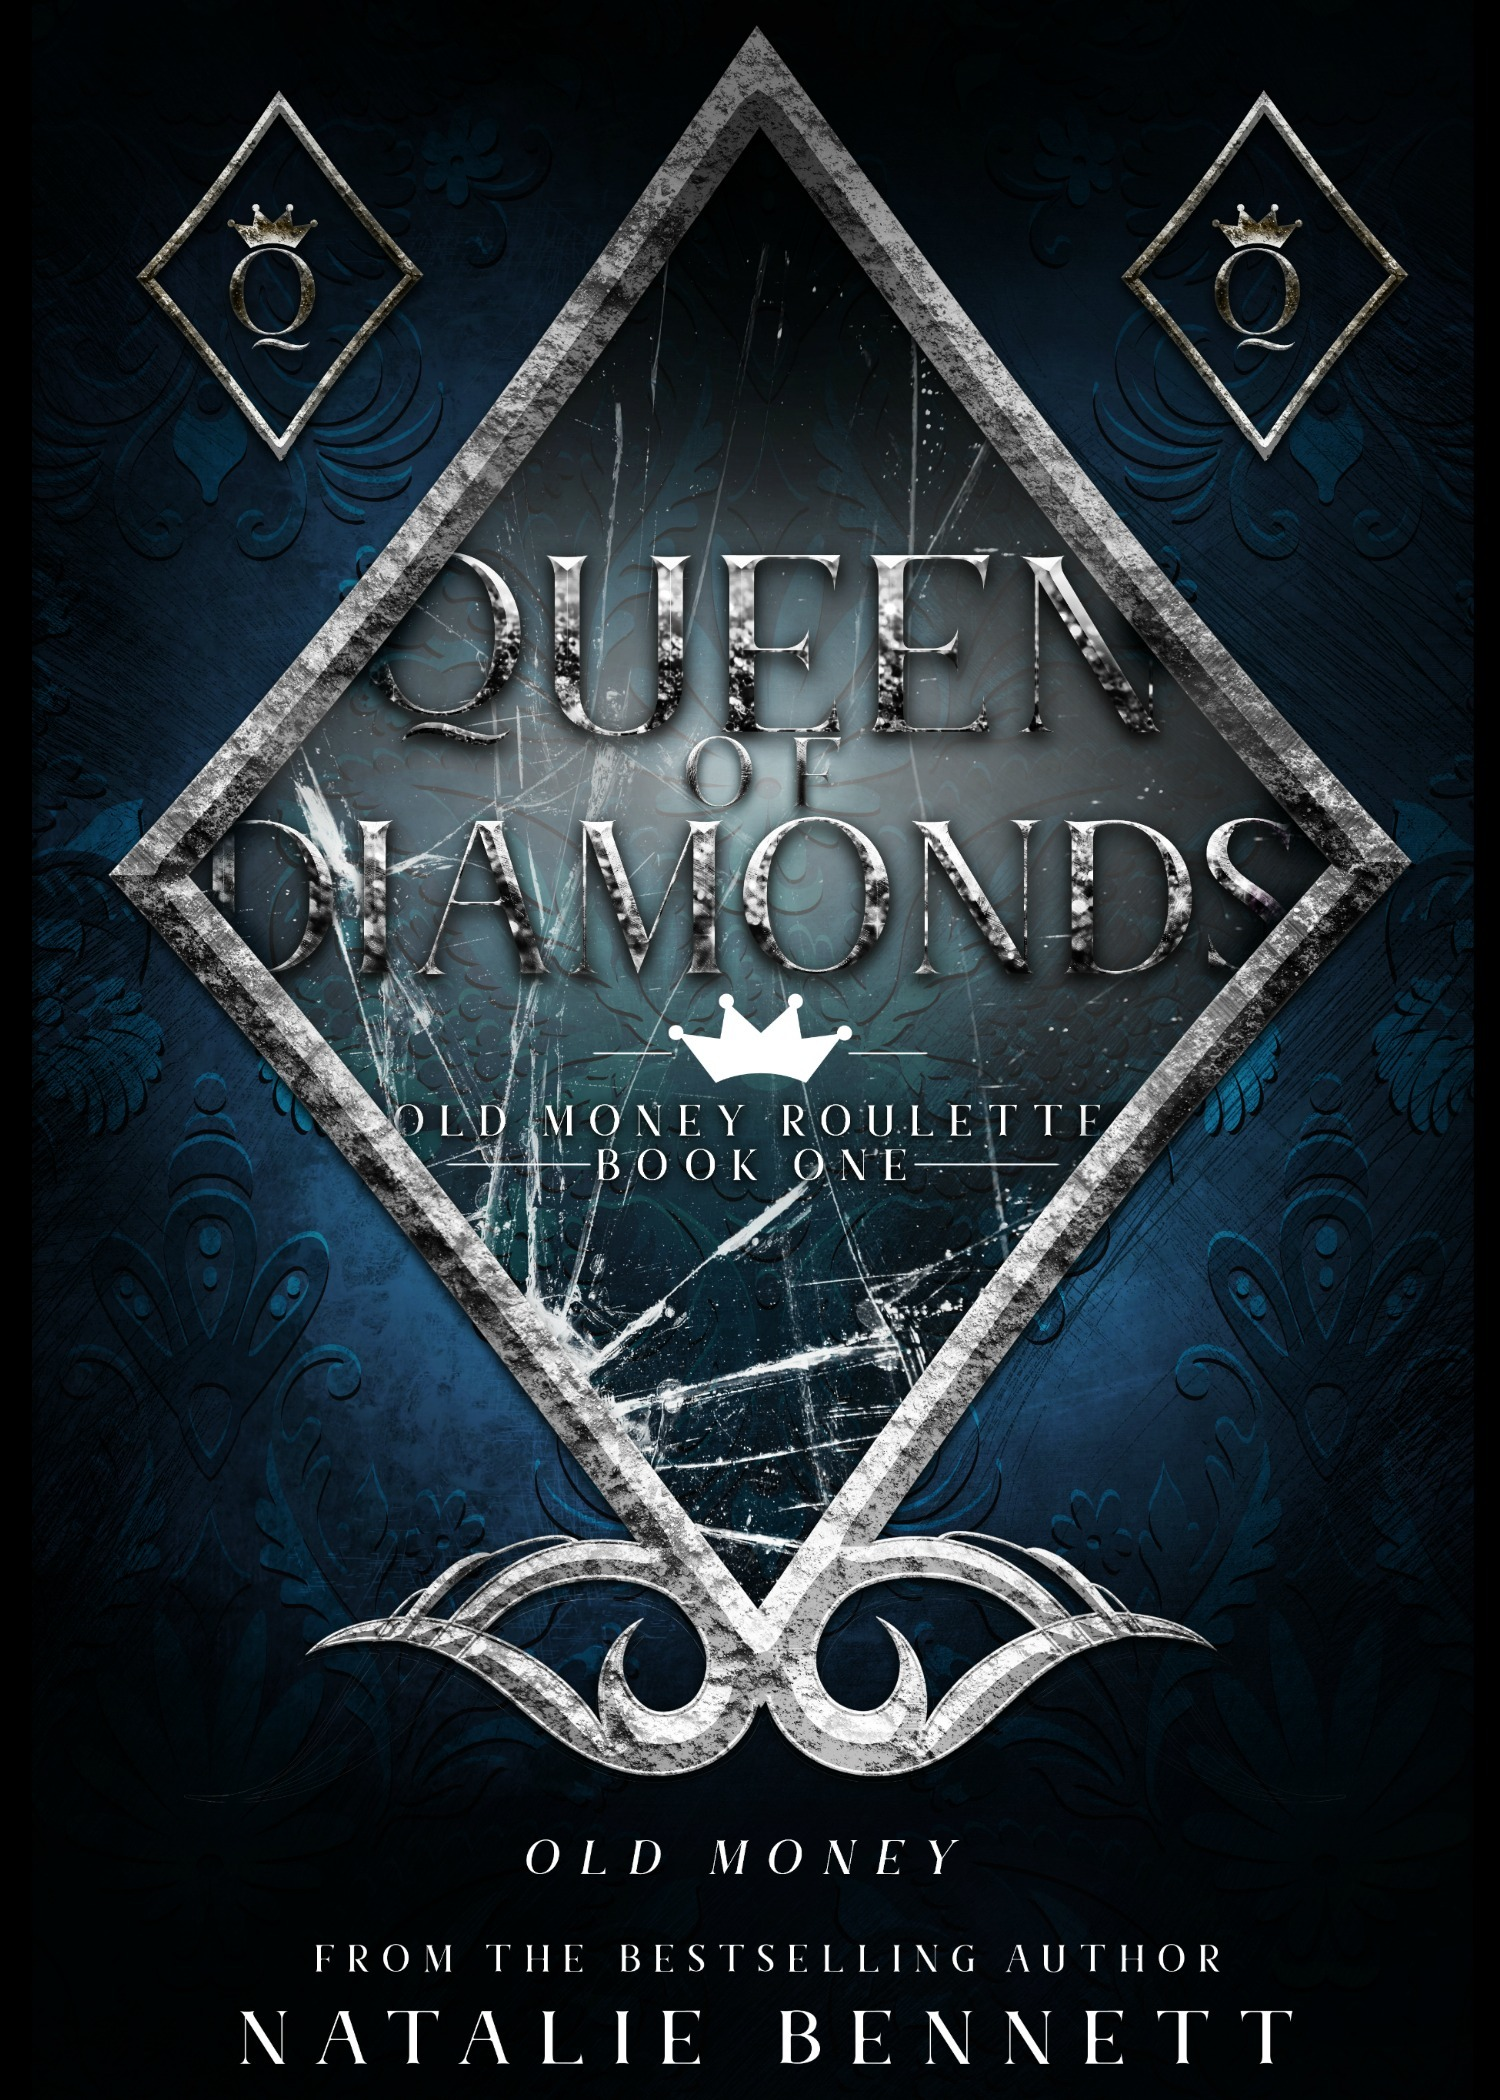 Queen of Diamonds (Old Money Roulette #1)